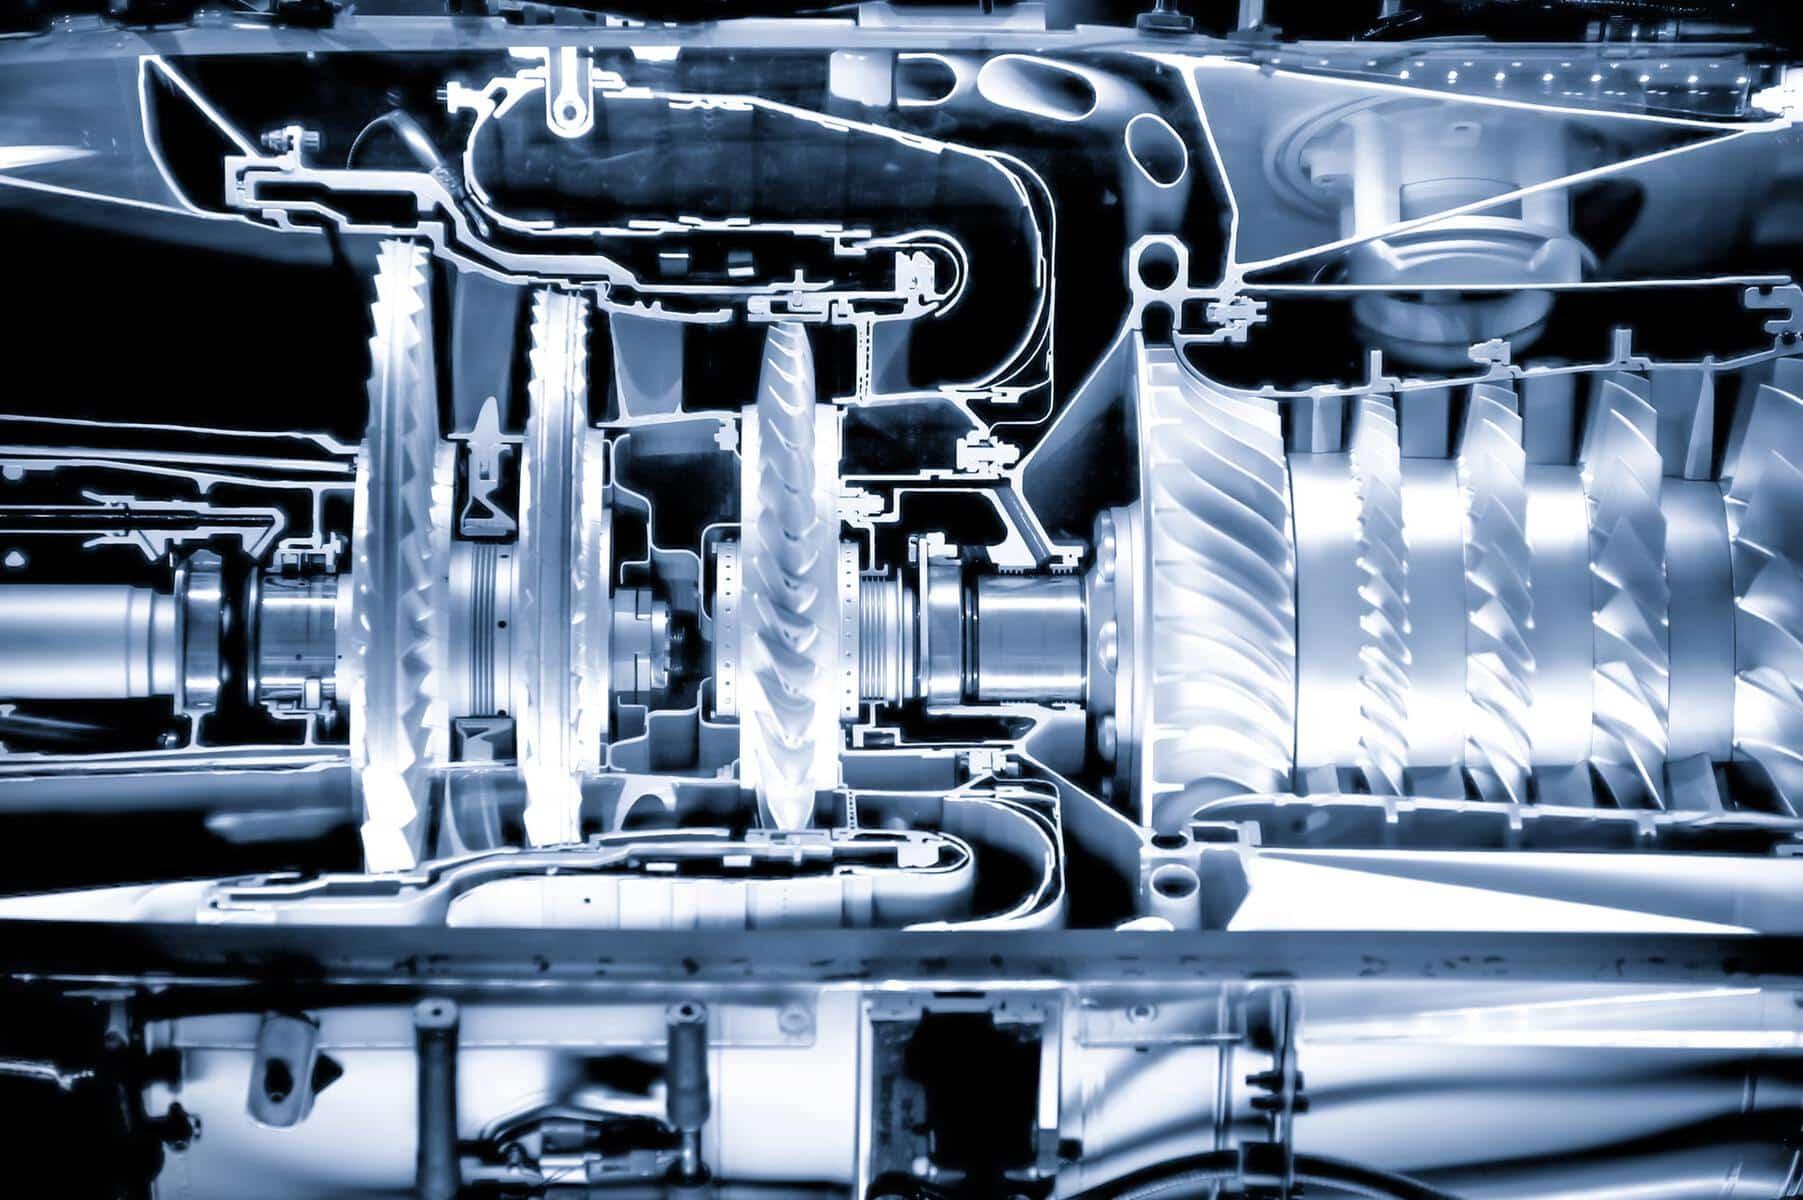 jet engine cutaway